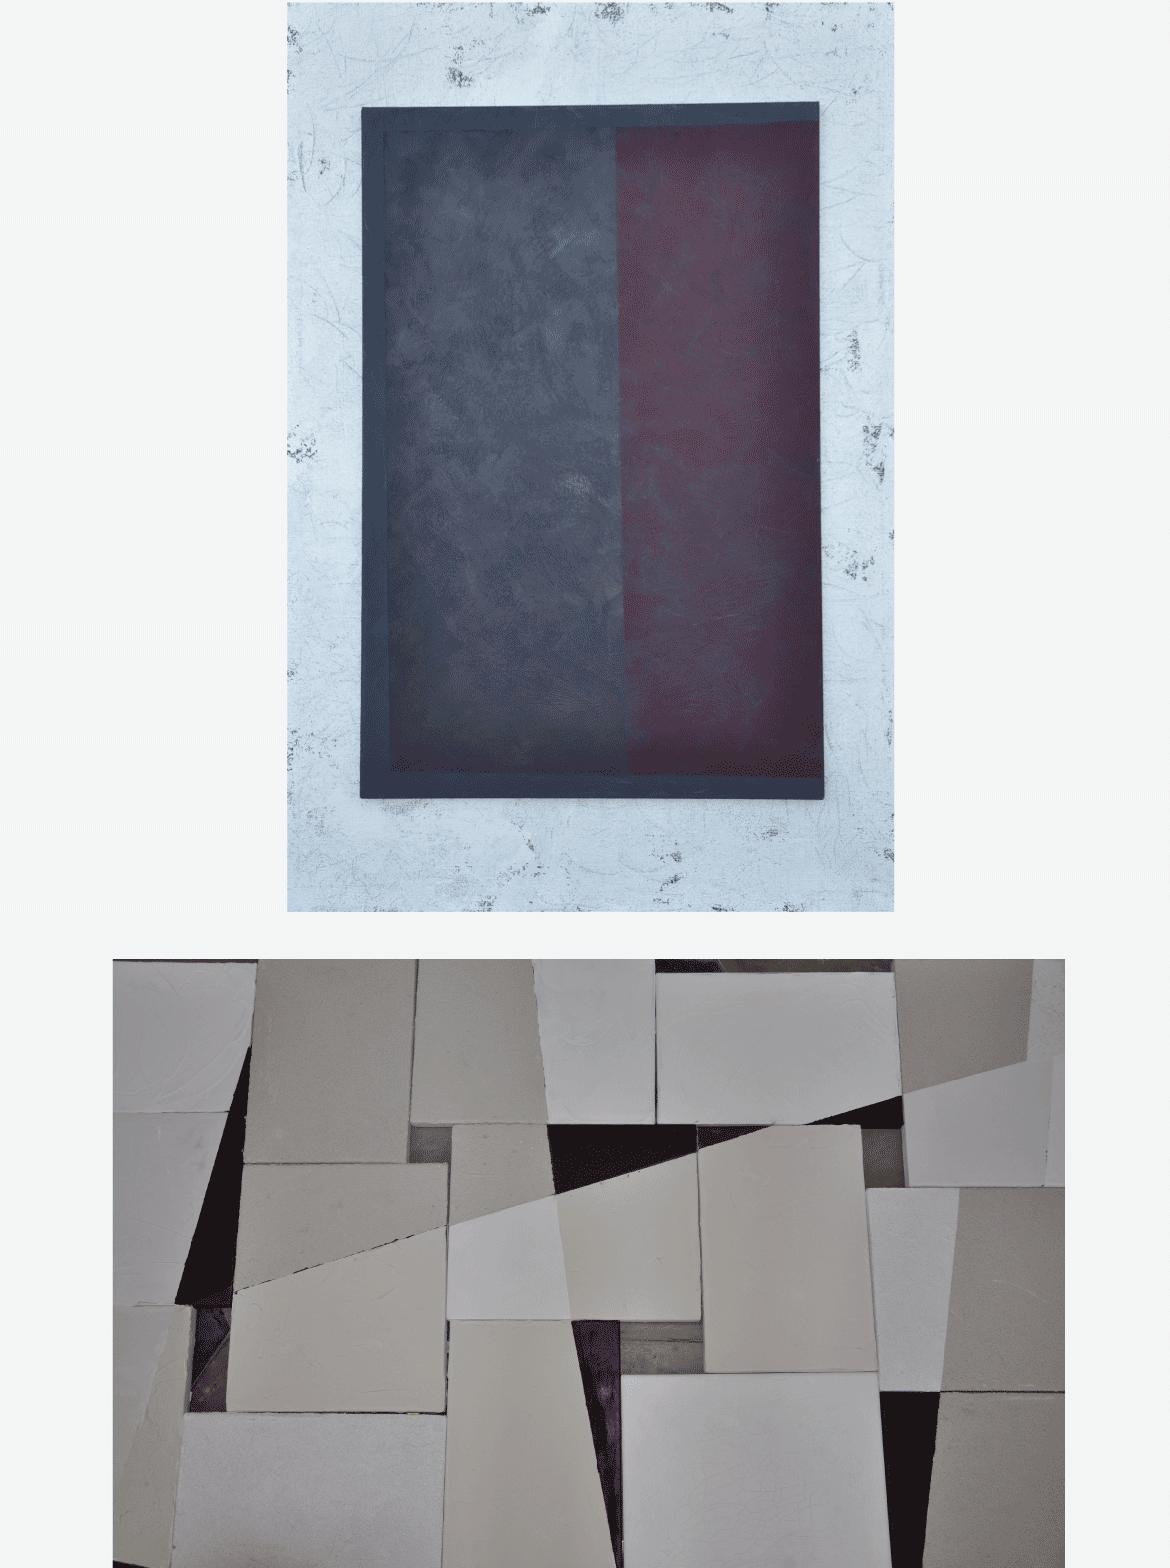 Shadows, opera di Margherita Caliendo